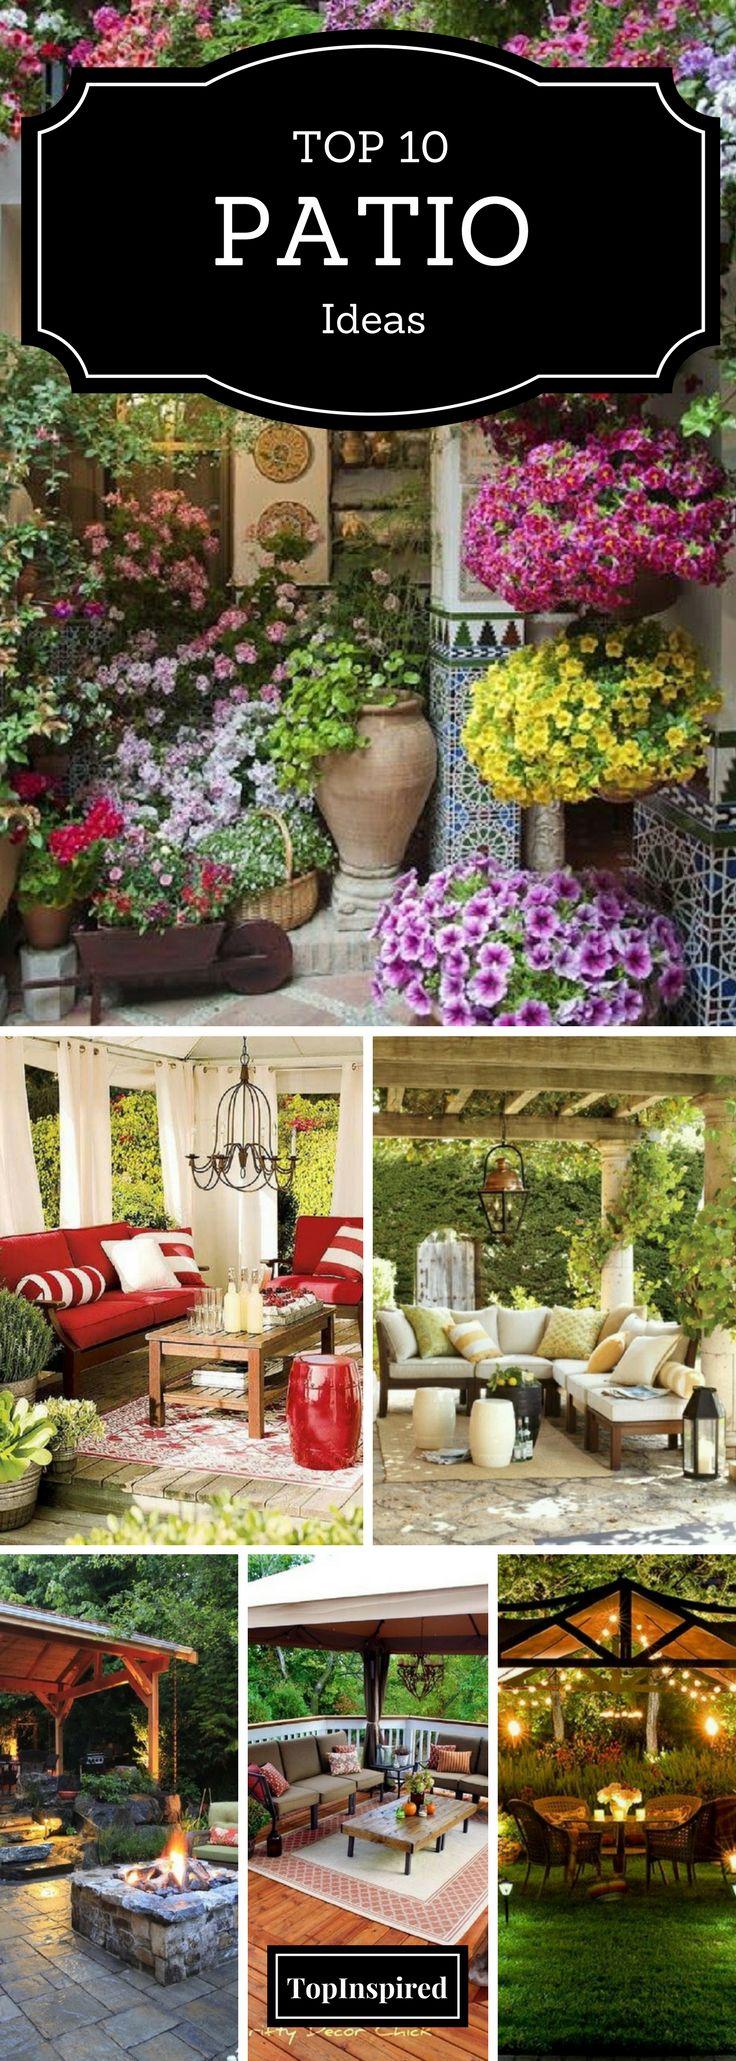 Patio Design Best 10 Patio Design Ideas On Pinterest Backyard Patio Designs